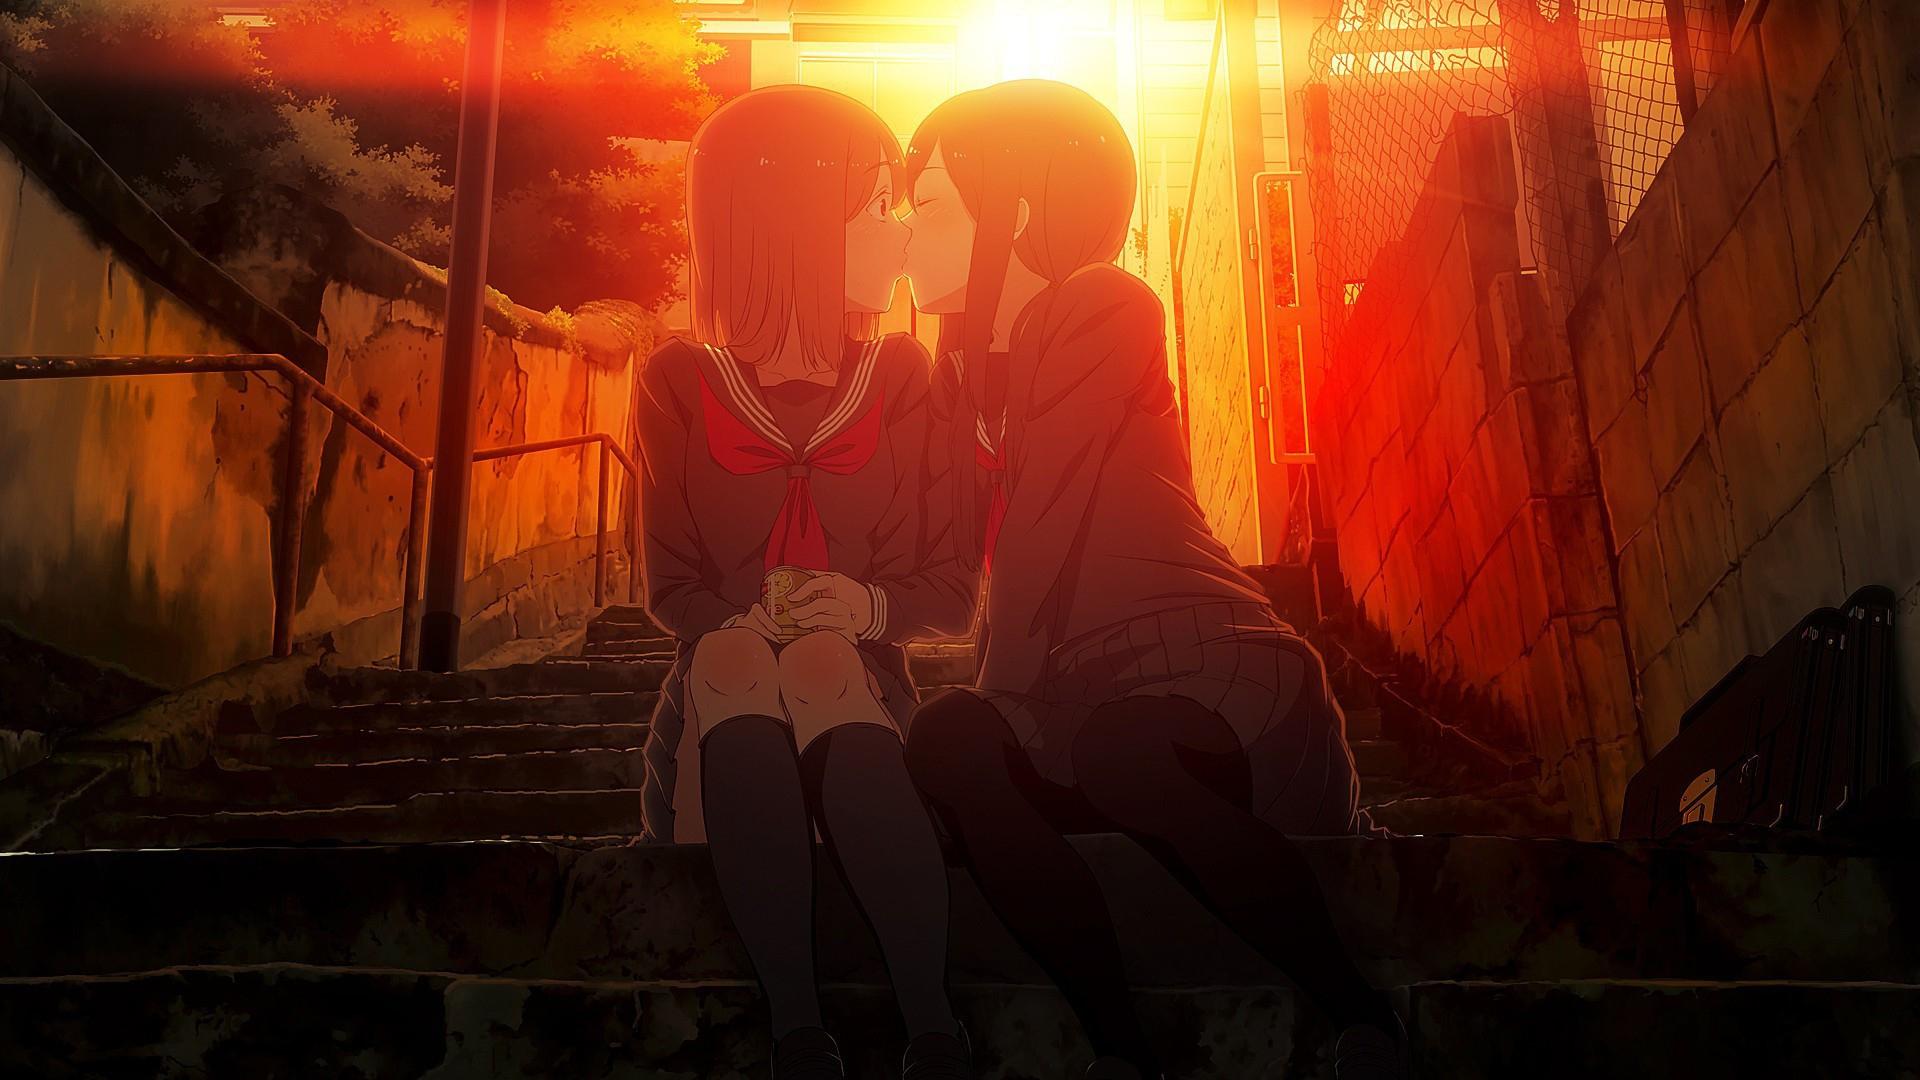 Anime Girls Kissing Desktop Wallpapers 1920x1080